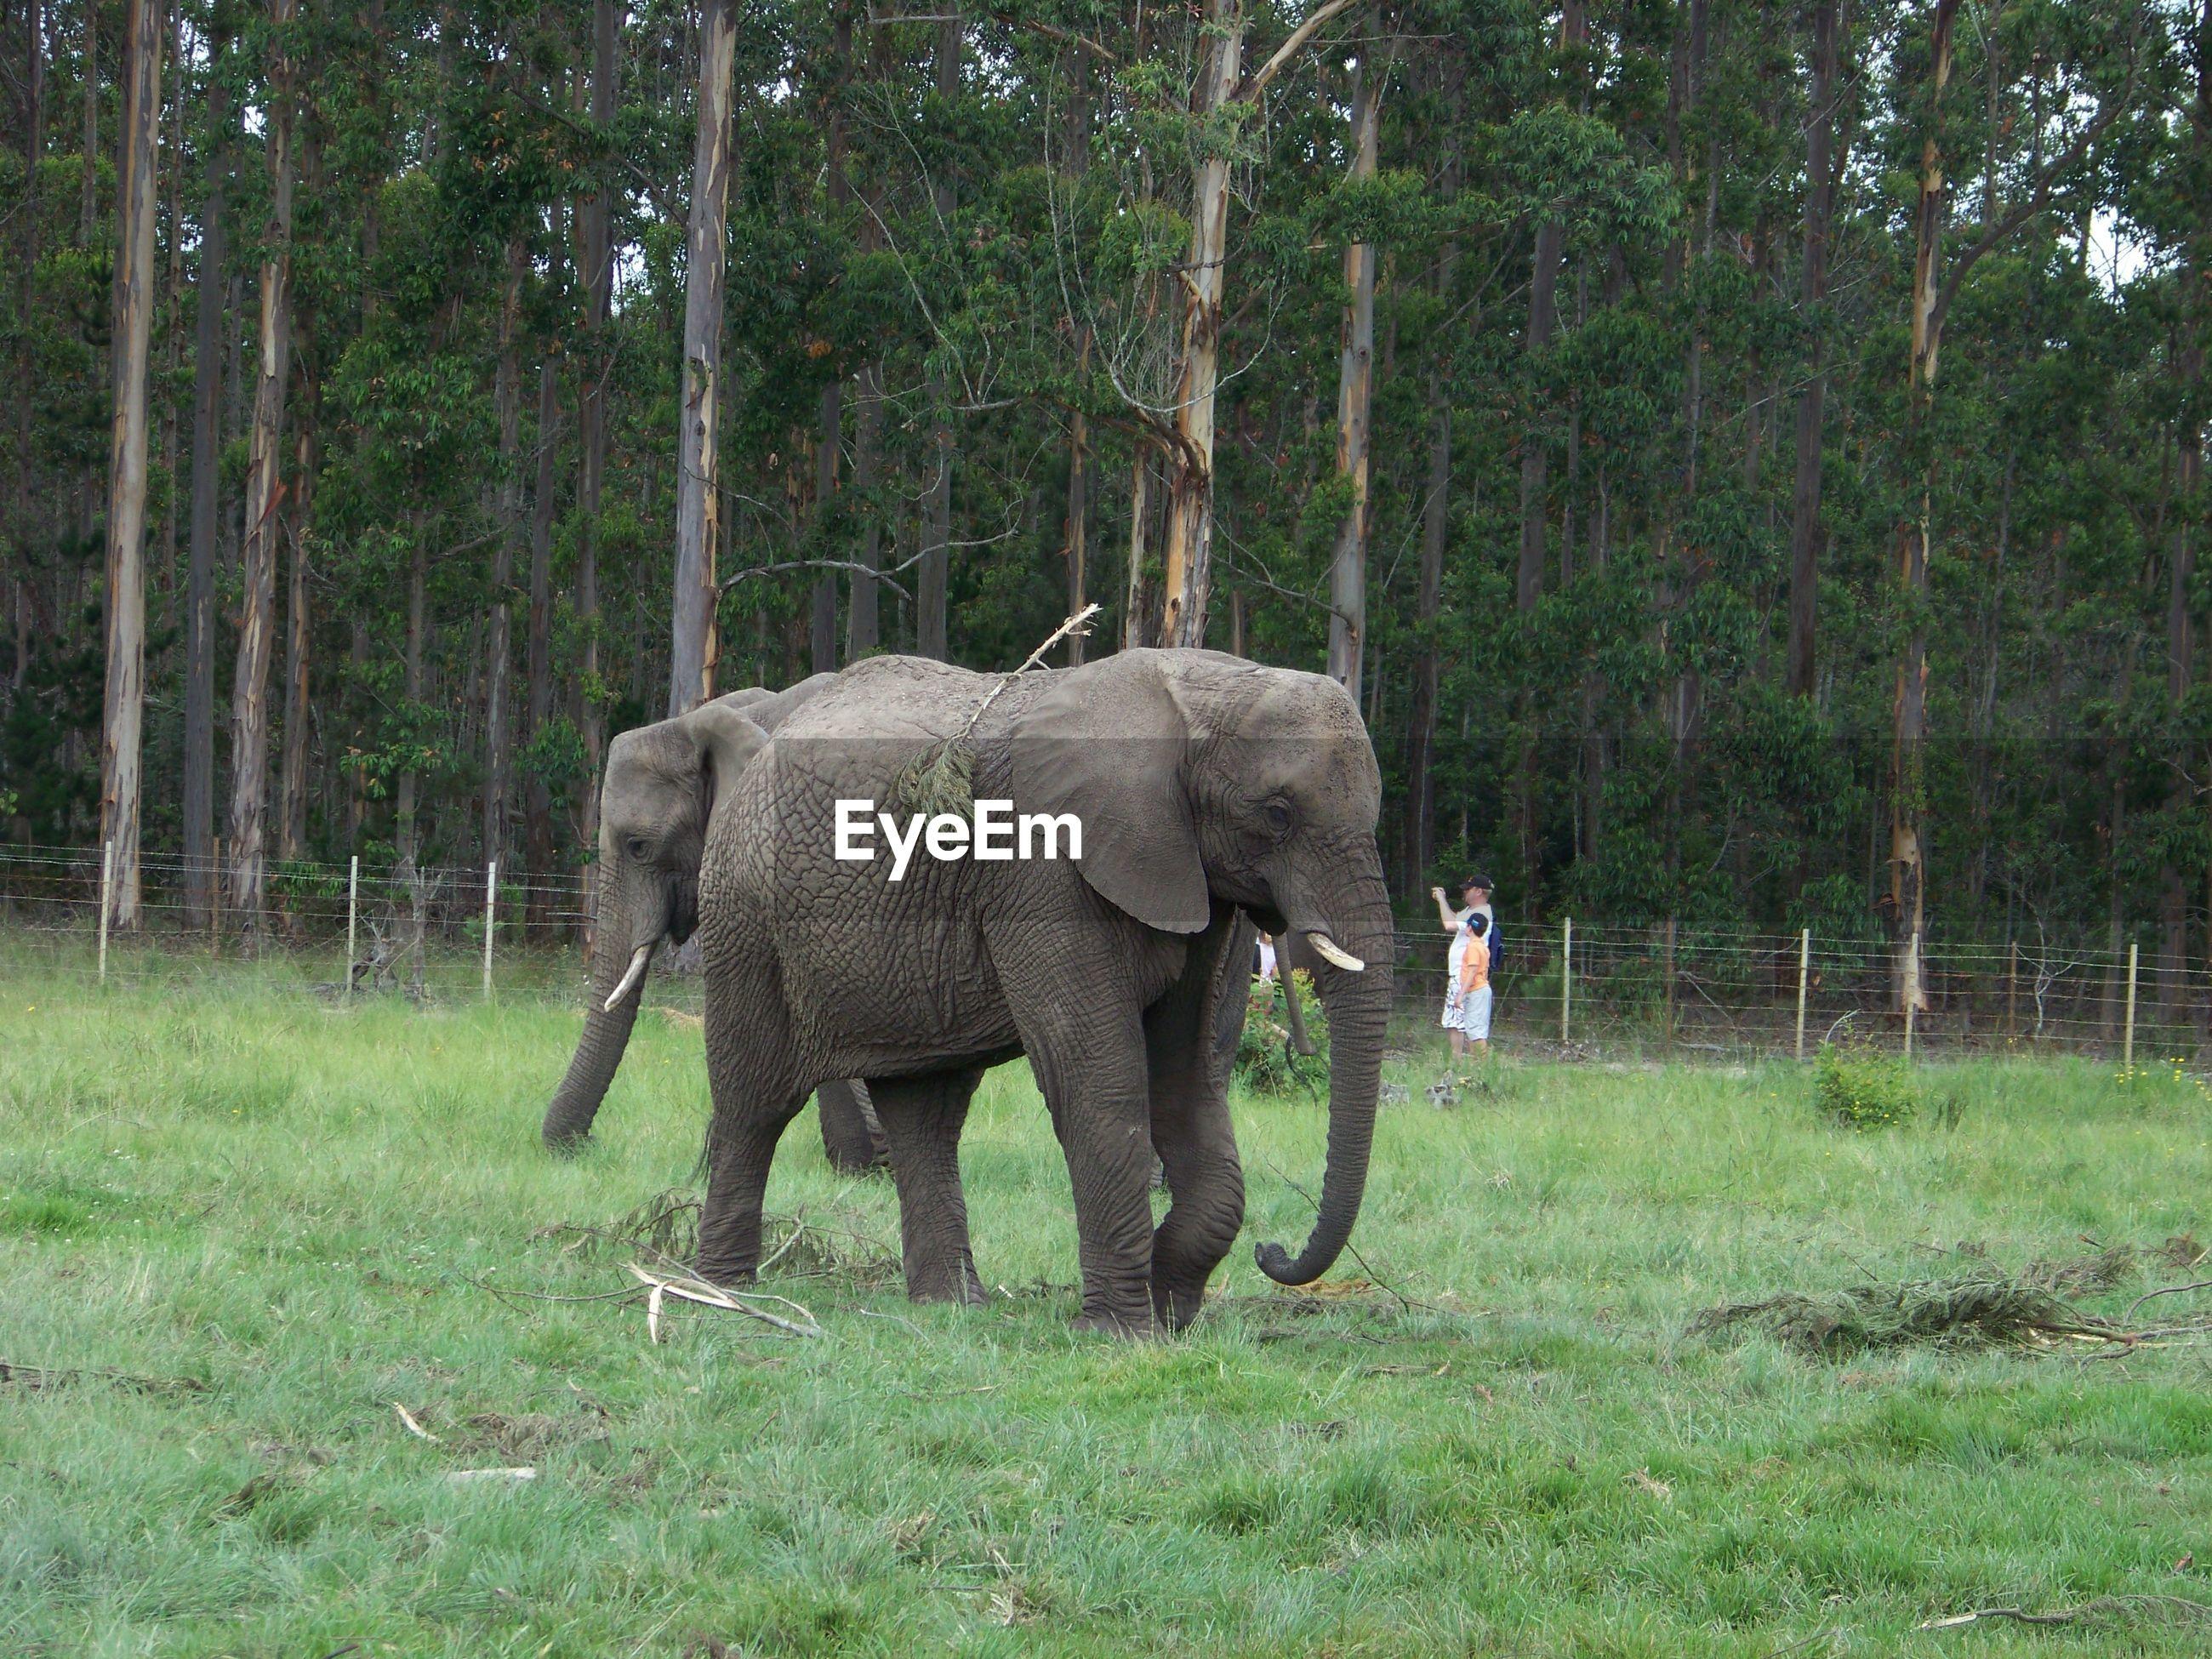 Elephants walking on grassy field at forest